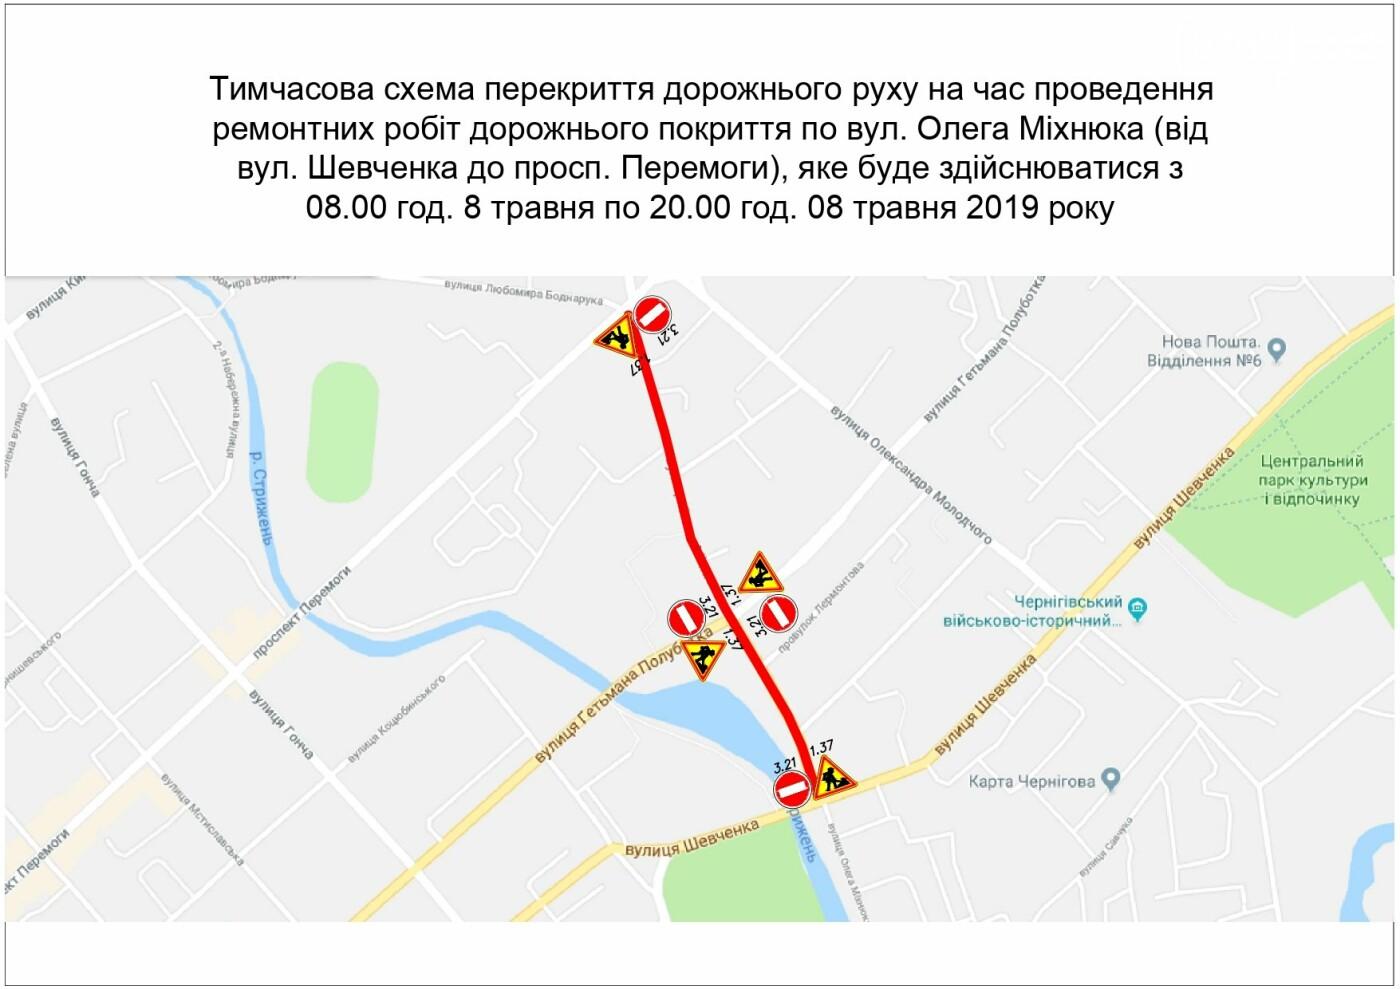 Завтра в Чернигове перекроют улицу, фото-1